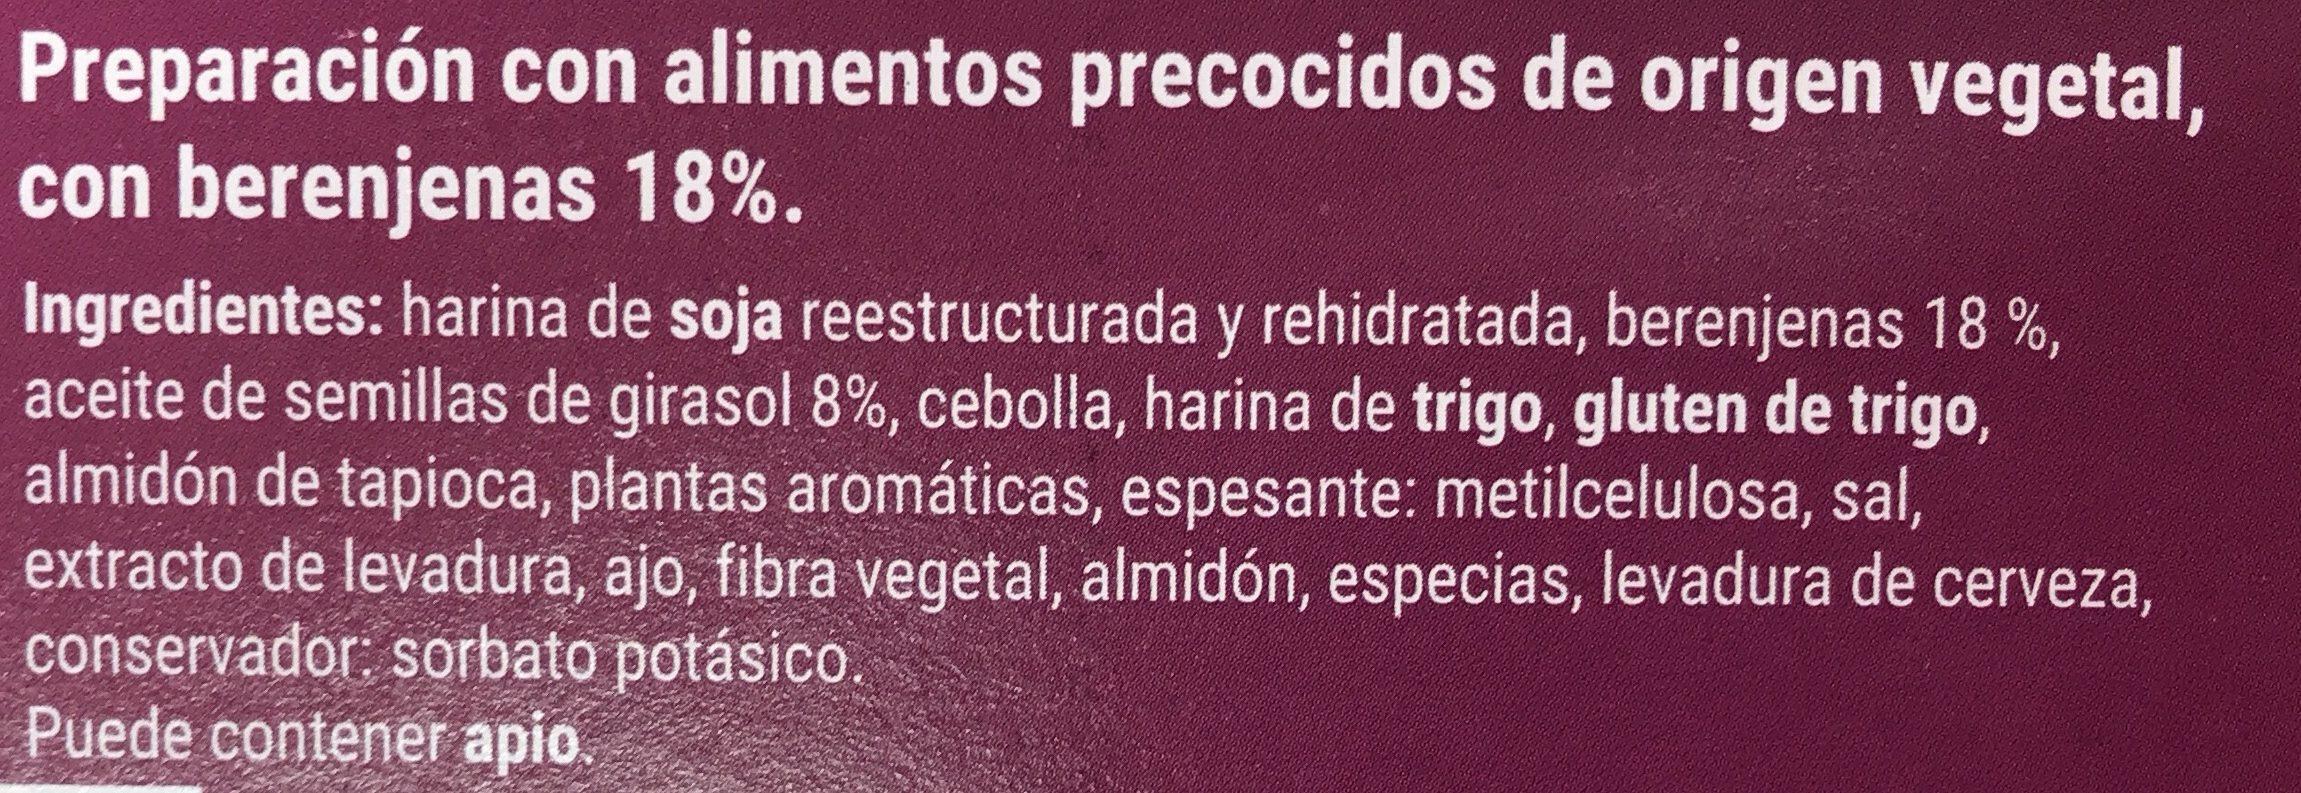 Hamburguesas vegetales con berenjenas - Ingredientes - es